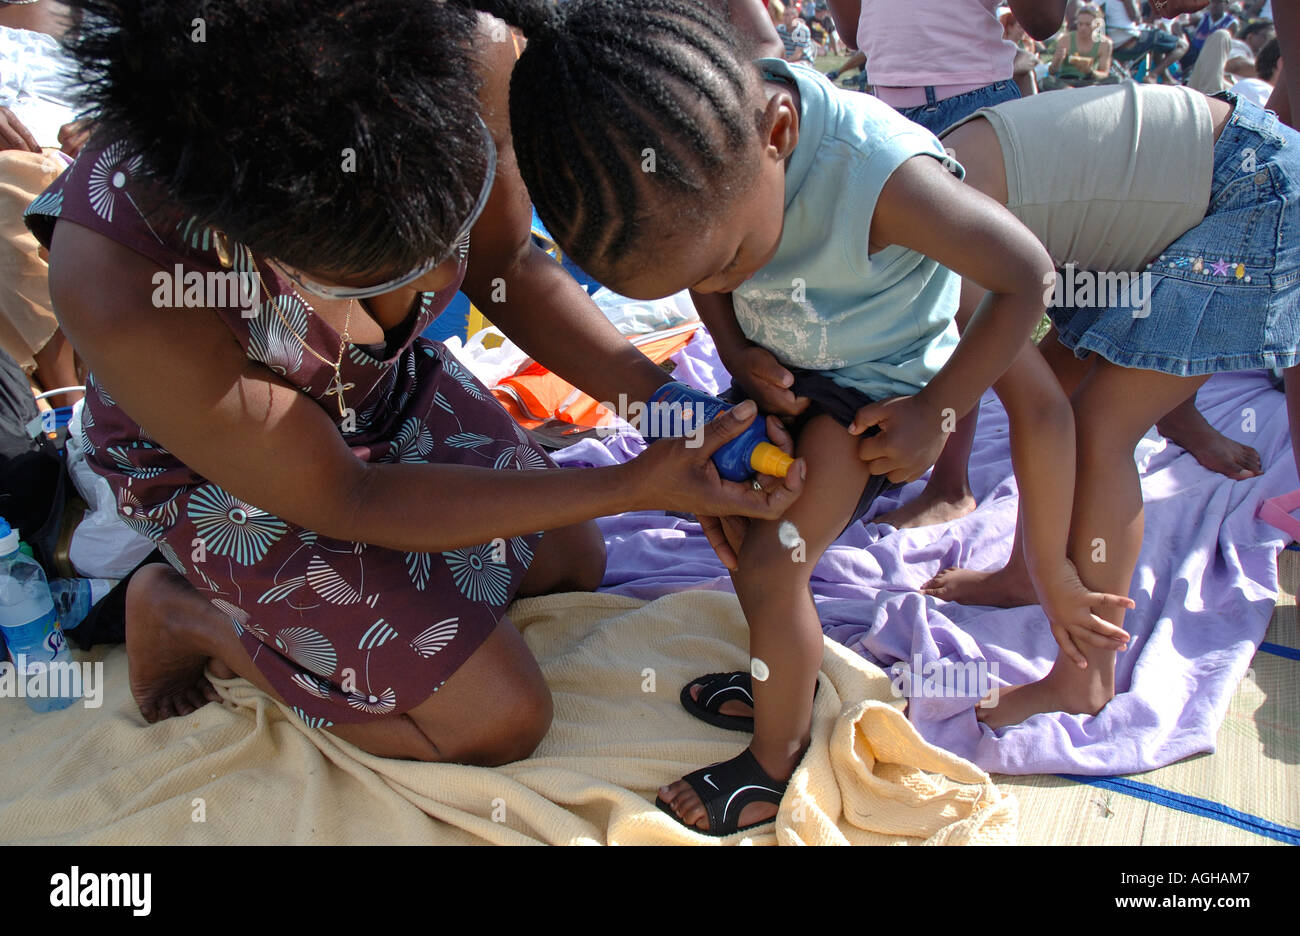 Mother putting suncream on child - Stock Image